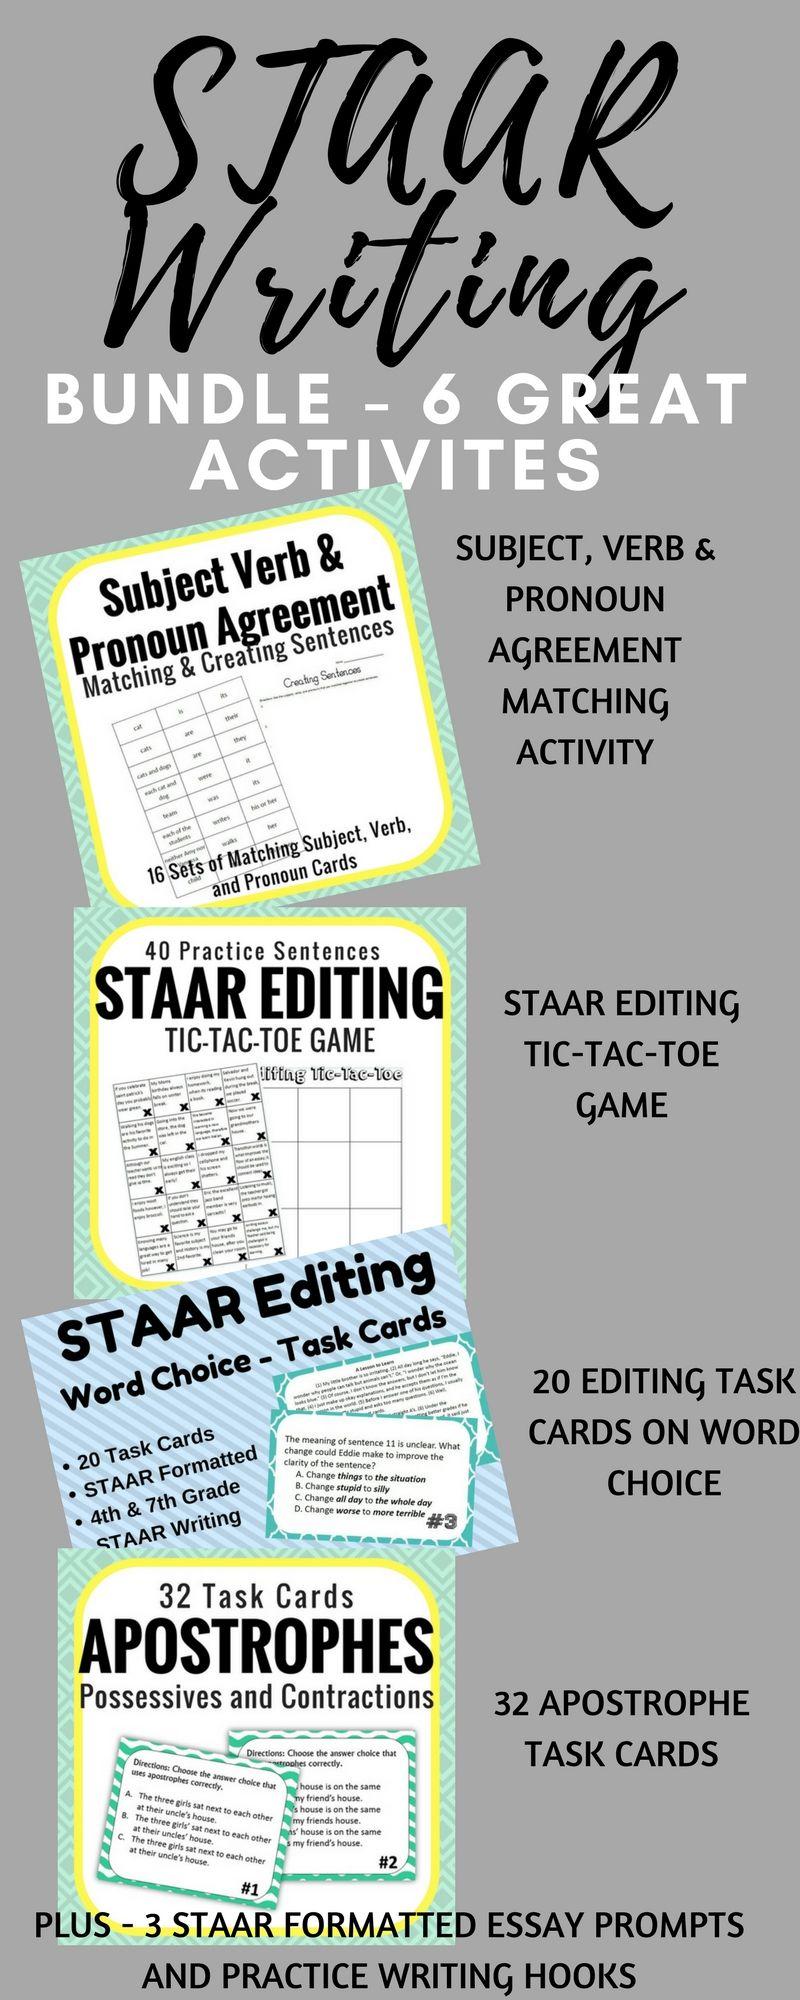 0010 STAAR Writing Test Prep Bundle Middle School Language